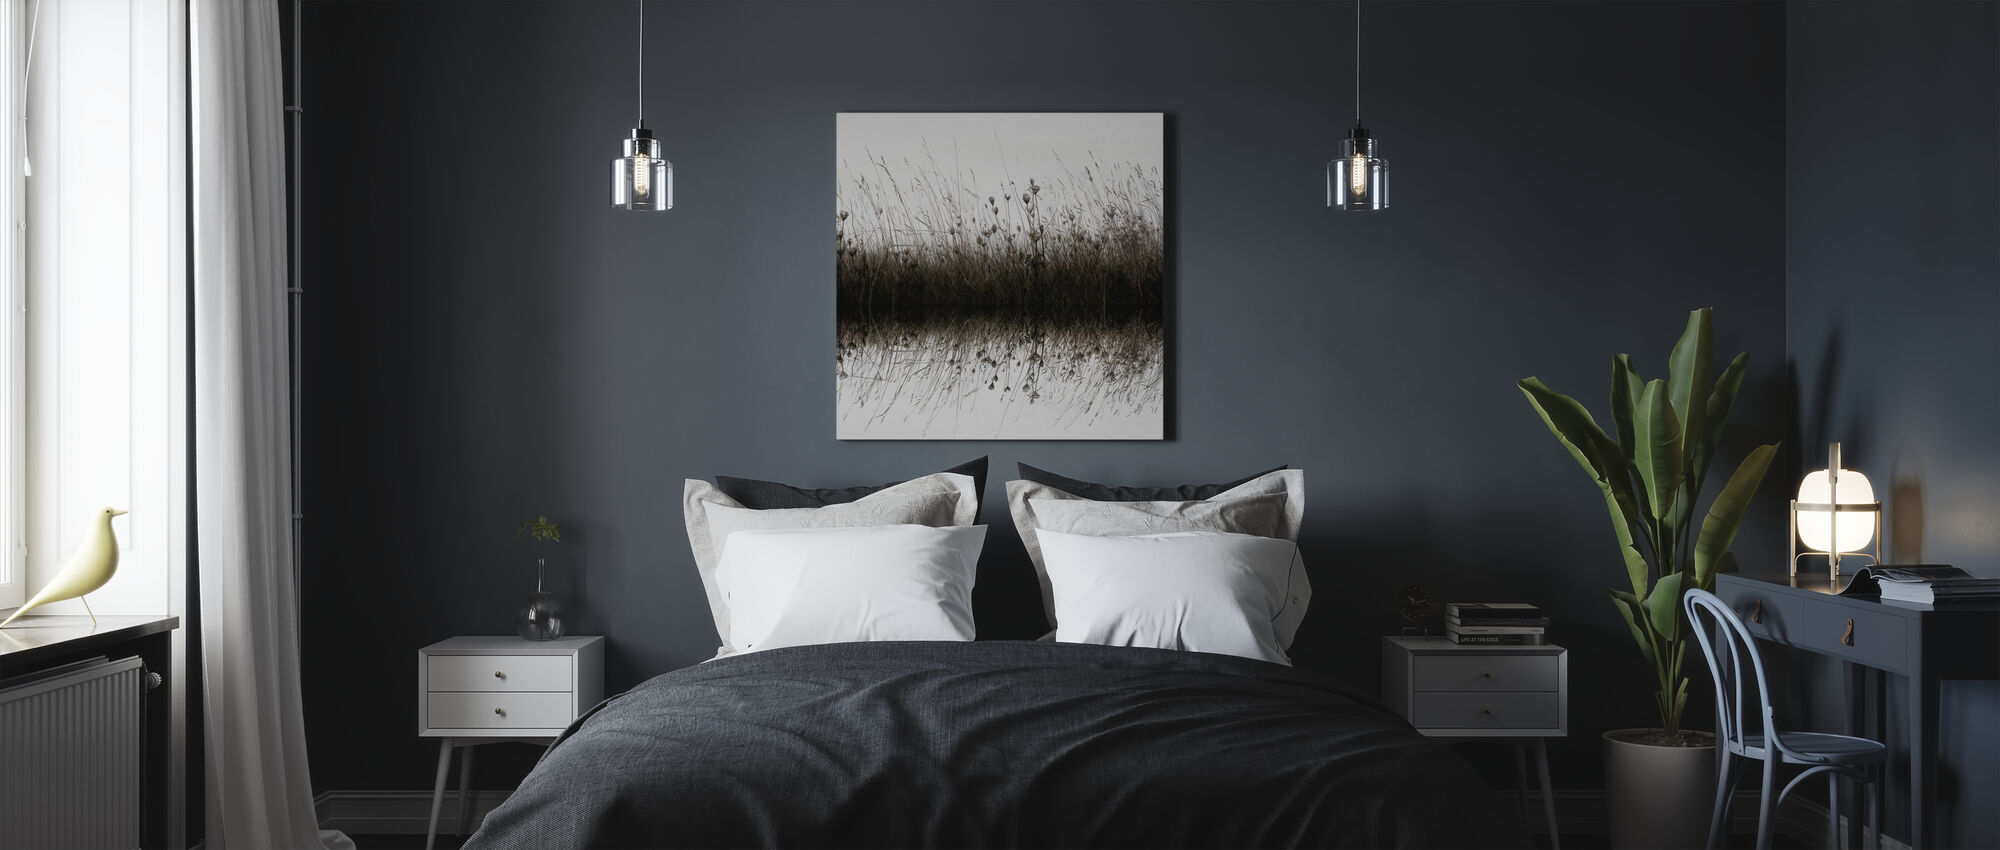 Vatten Reflektion Vildblommor - Canvastavla - Sovrum